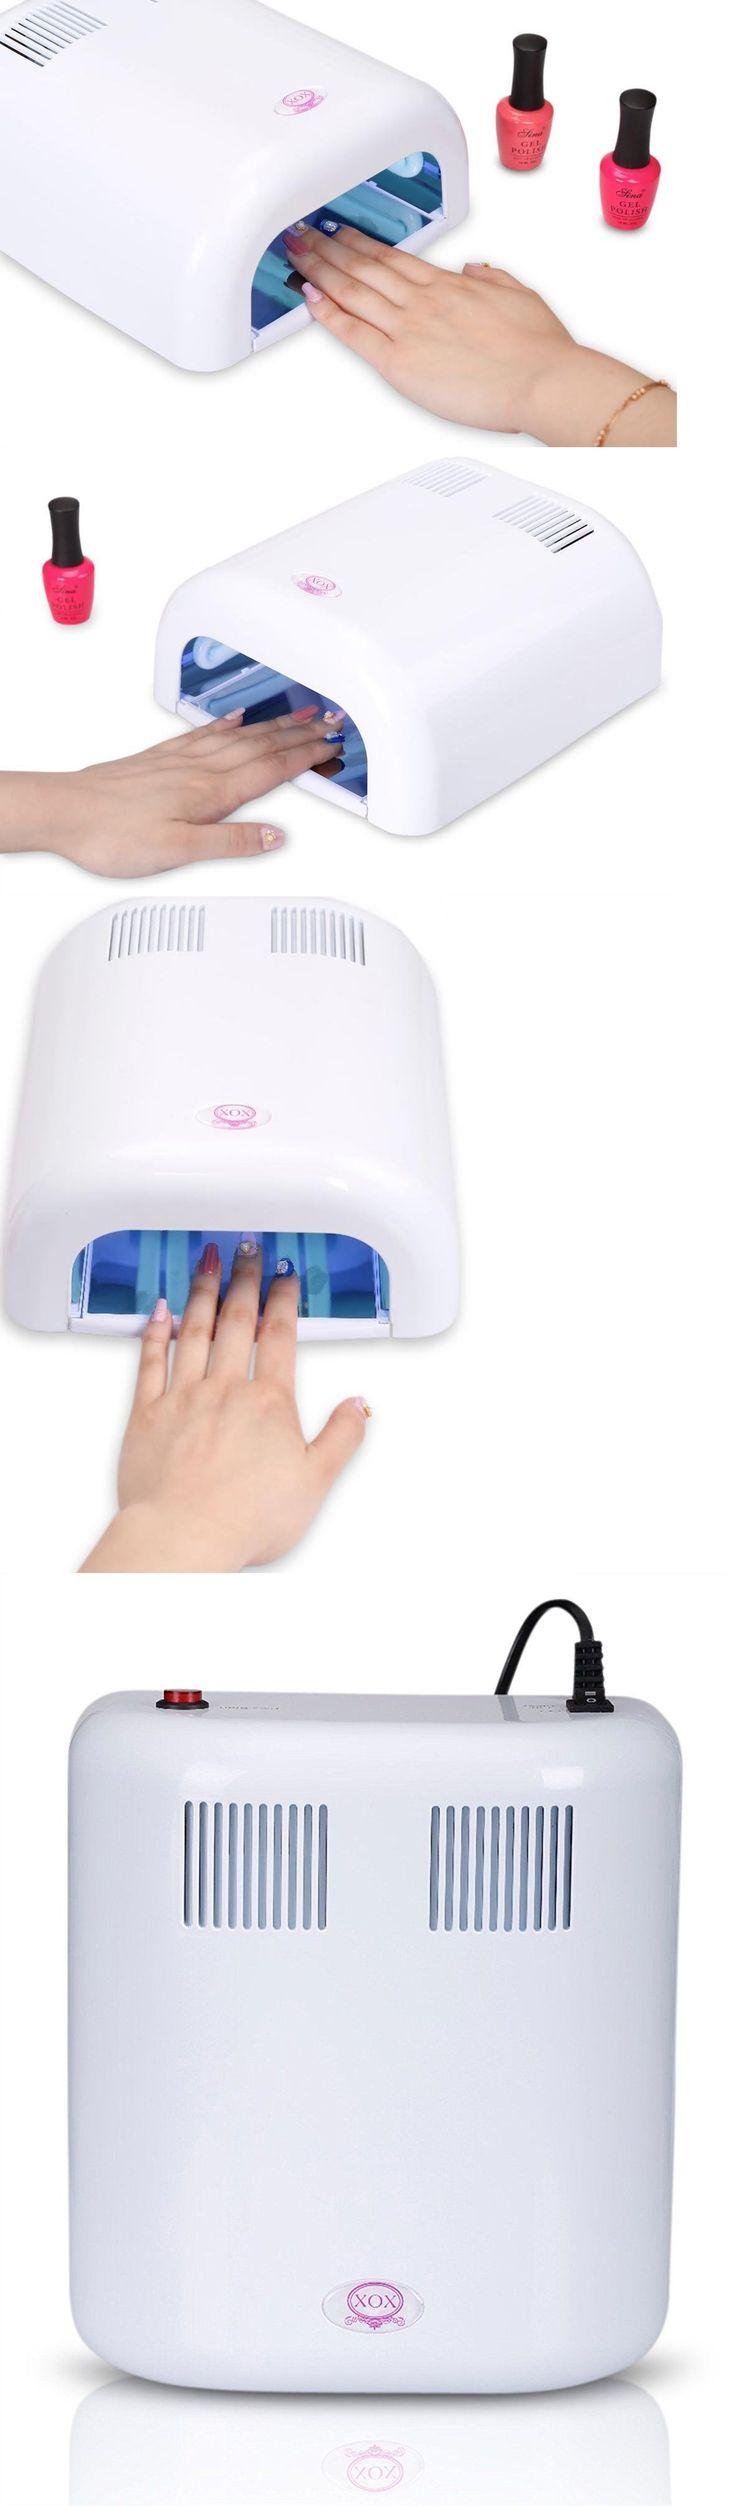 Nail Dryers and UV LED Lamps: (Xox) Portable Nail Polish Dryer W/36 Watt Led Uv Light Lamp W/Fan/Glove New C3 -> BUY IT NOW ONLY: $43.95 on eBay!